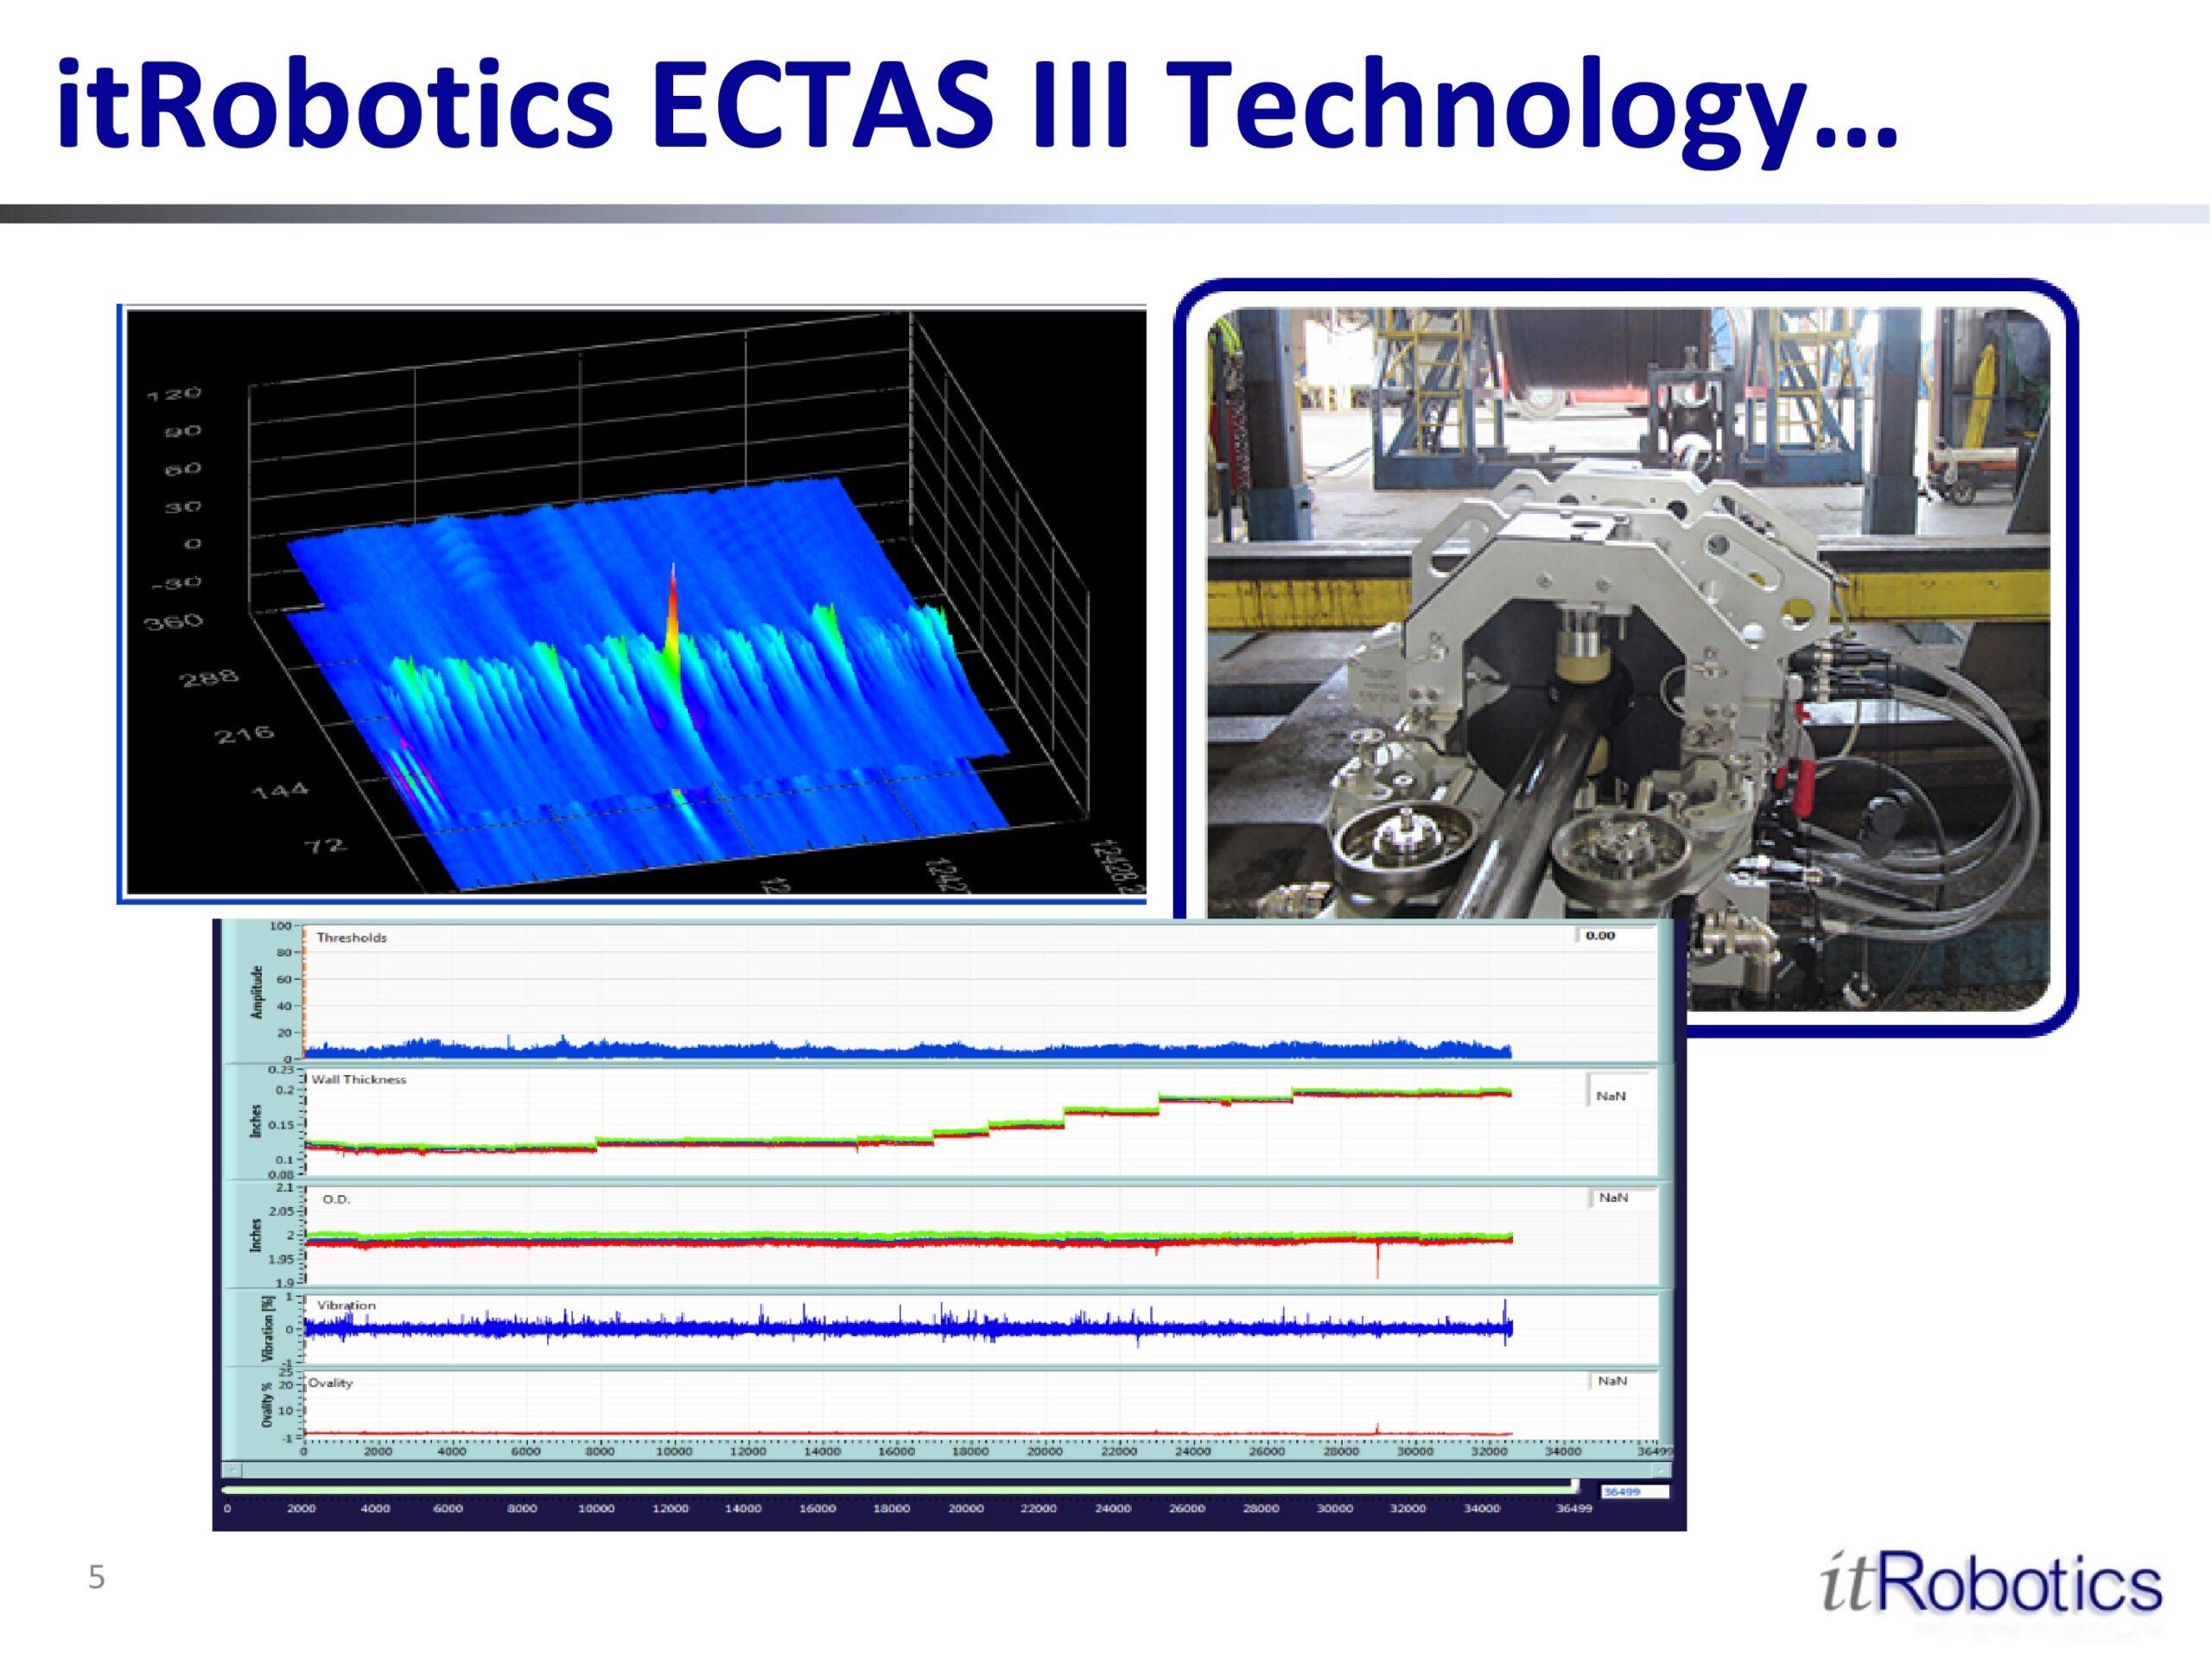 itRobotics ECTAS III Technology